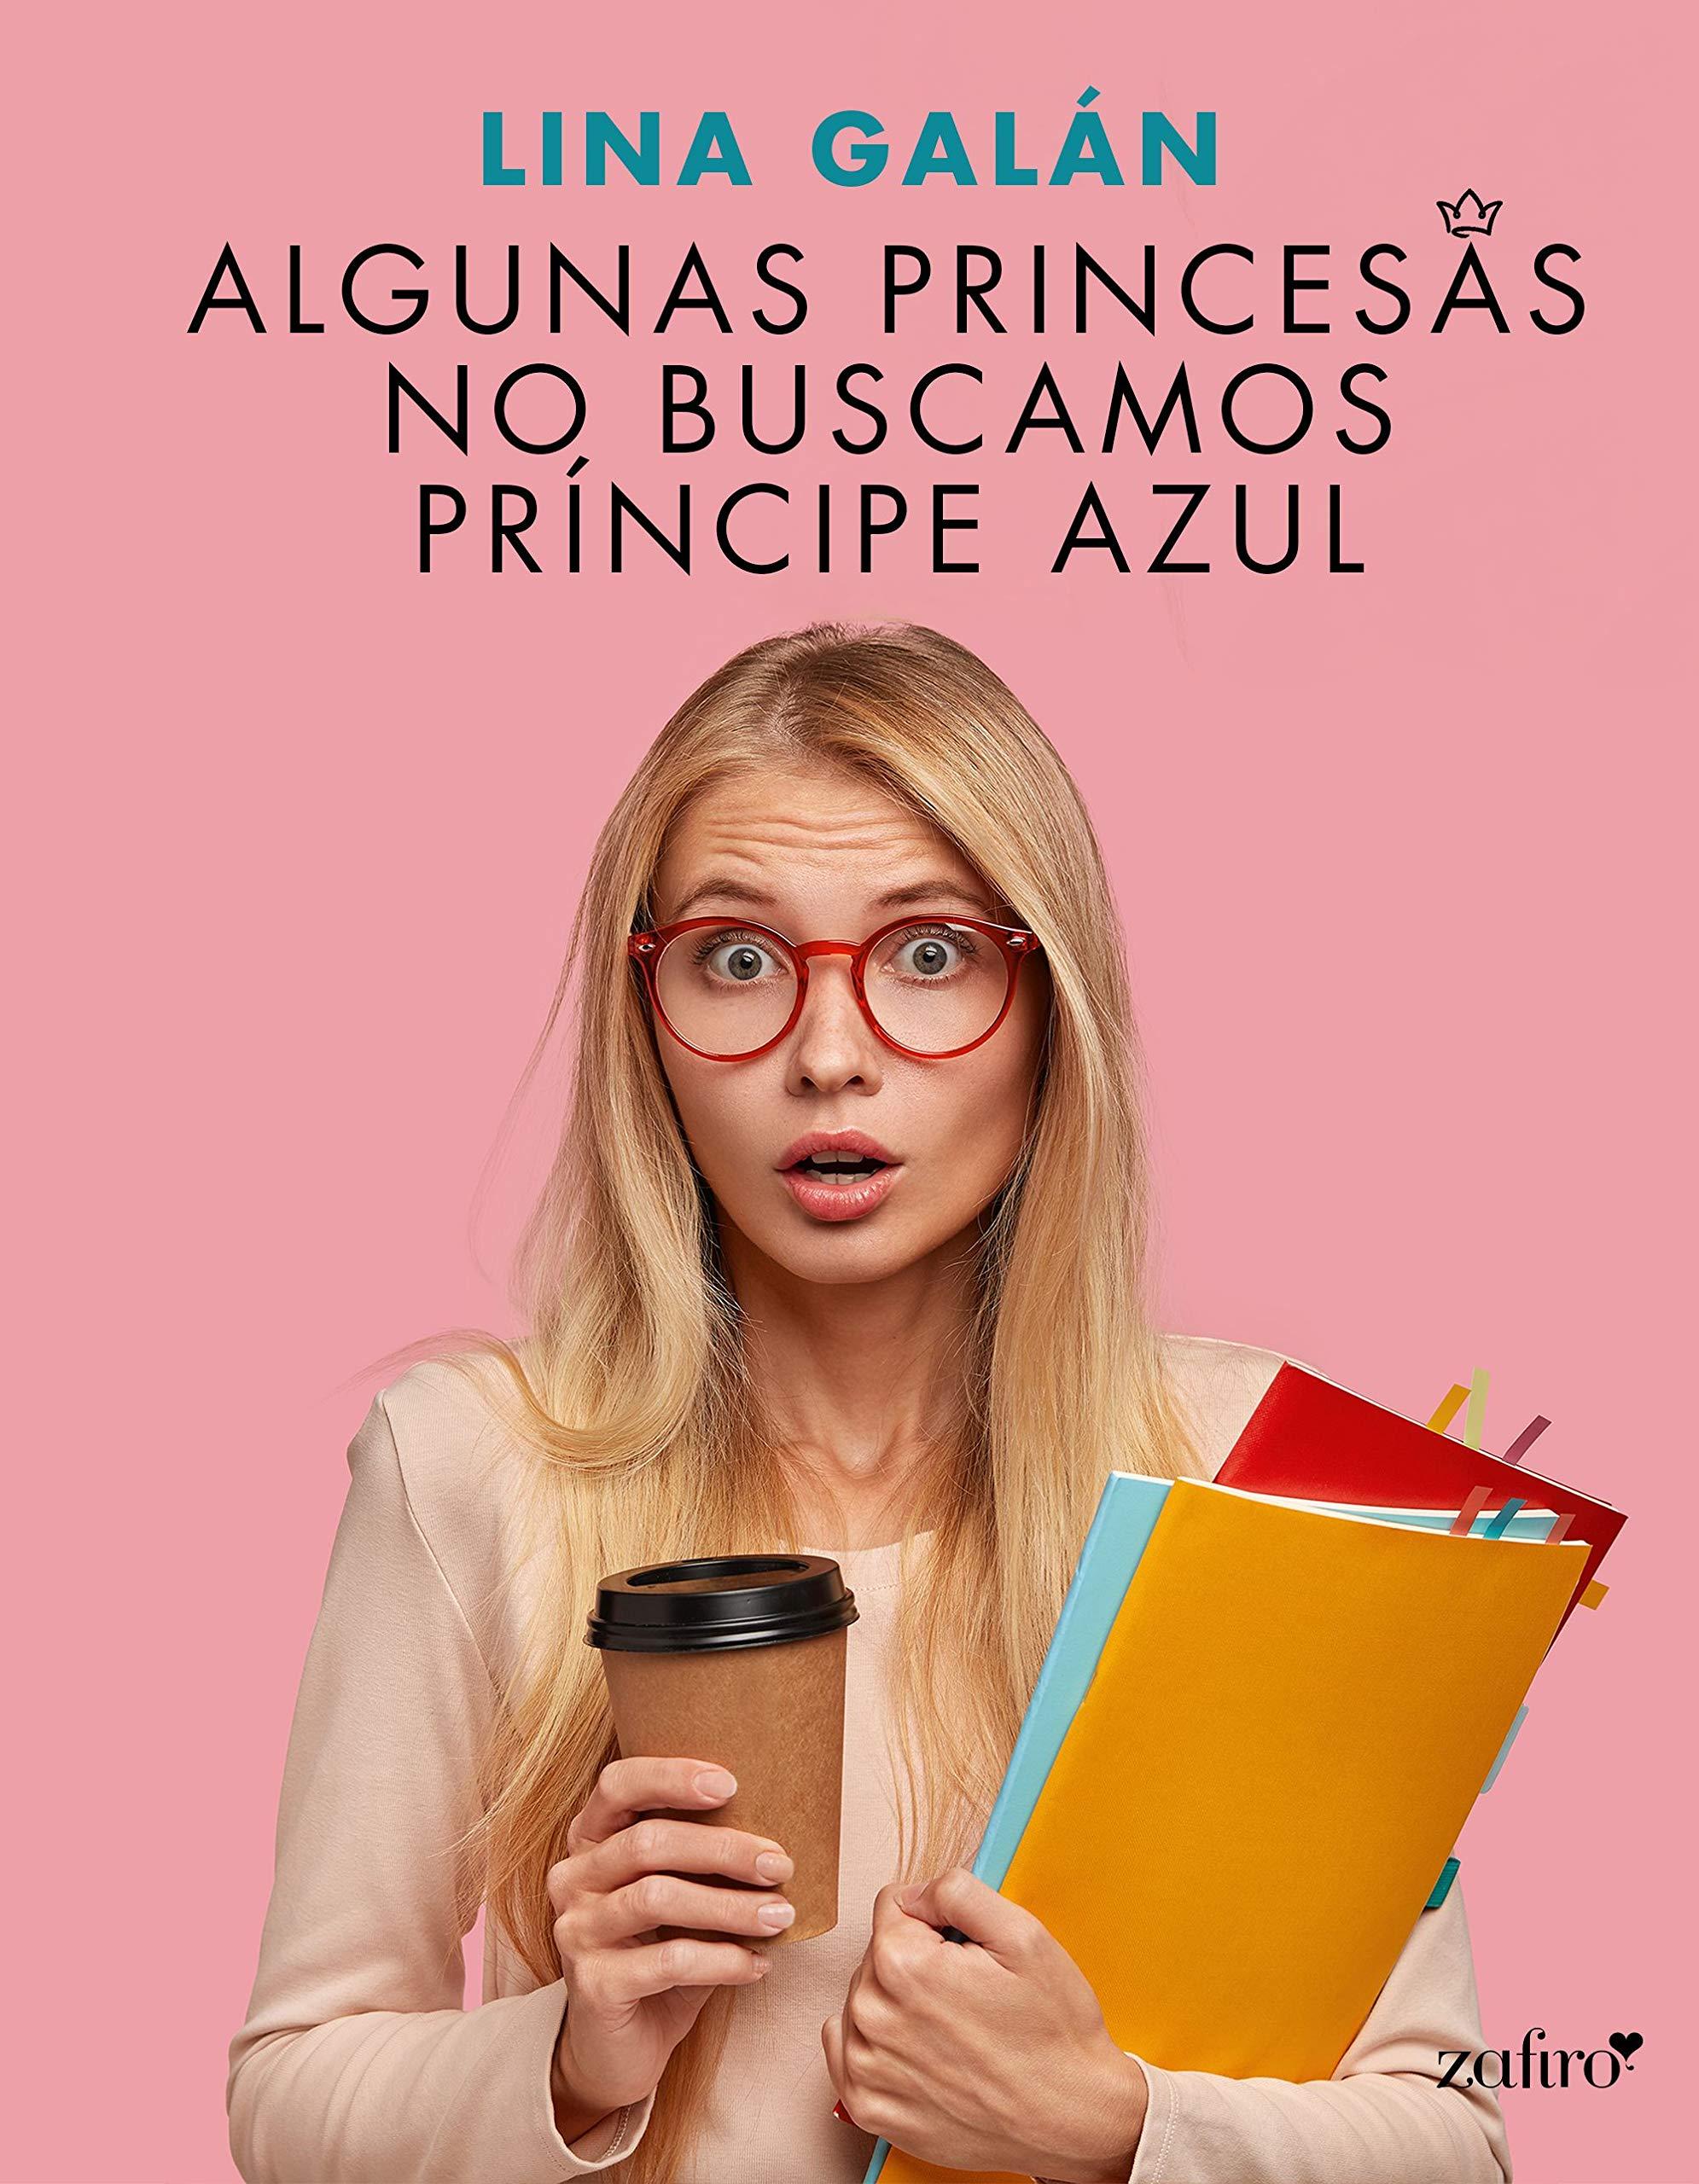 Algunas princesas no buscamos príncipe azul por Lina Galán